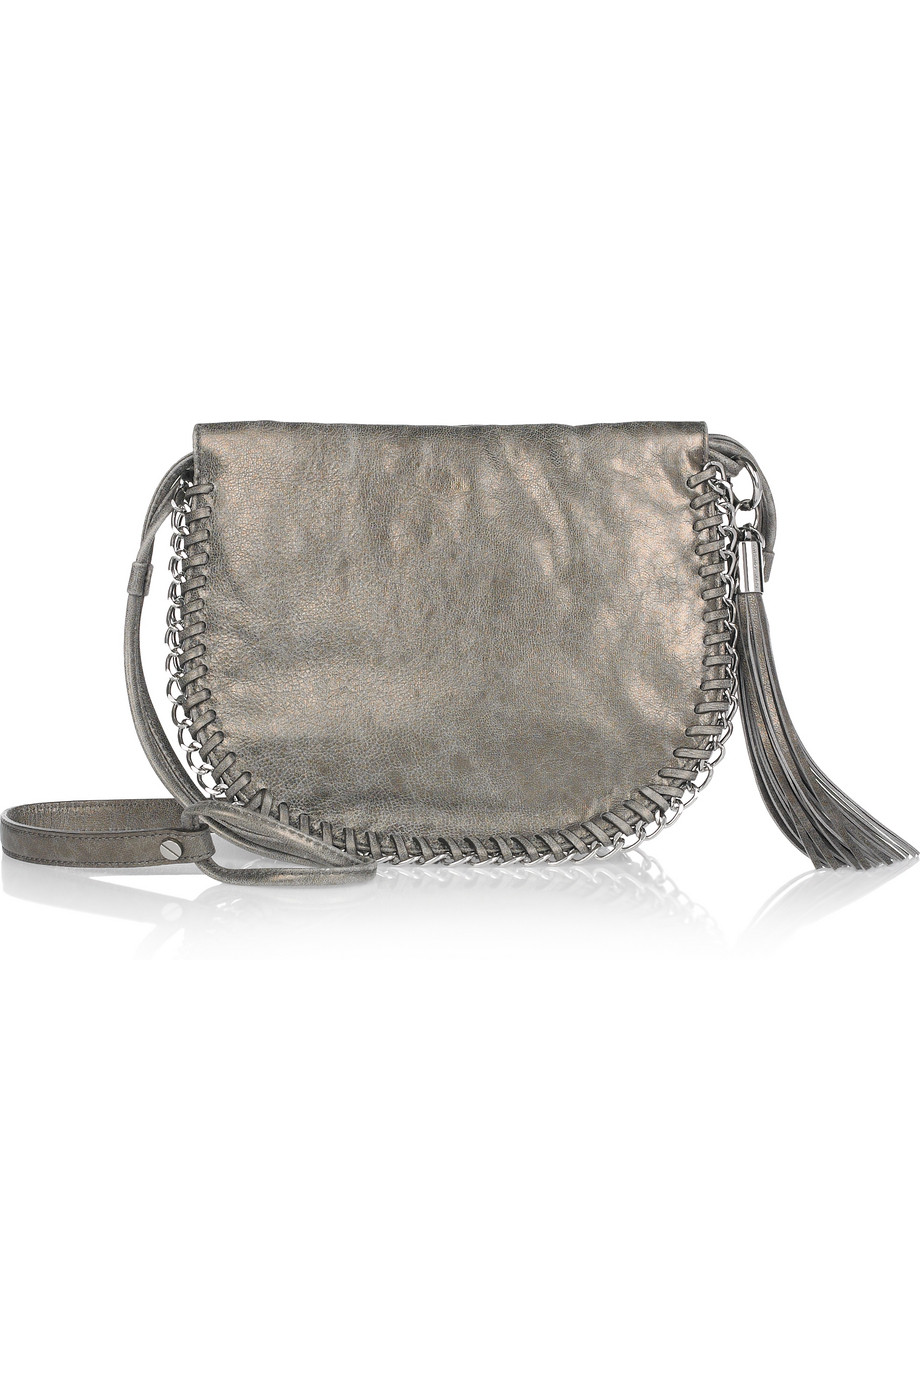 Michael Kors Fox Fur Shoulder Bag 24